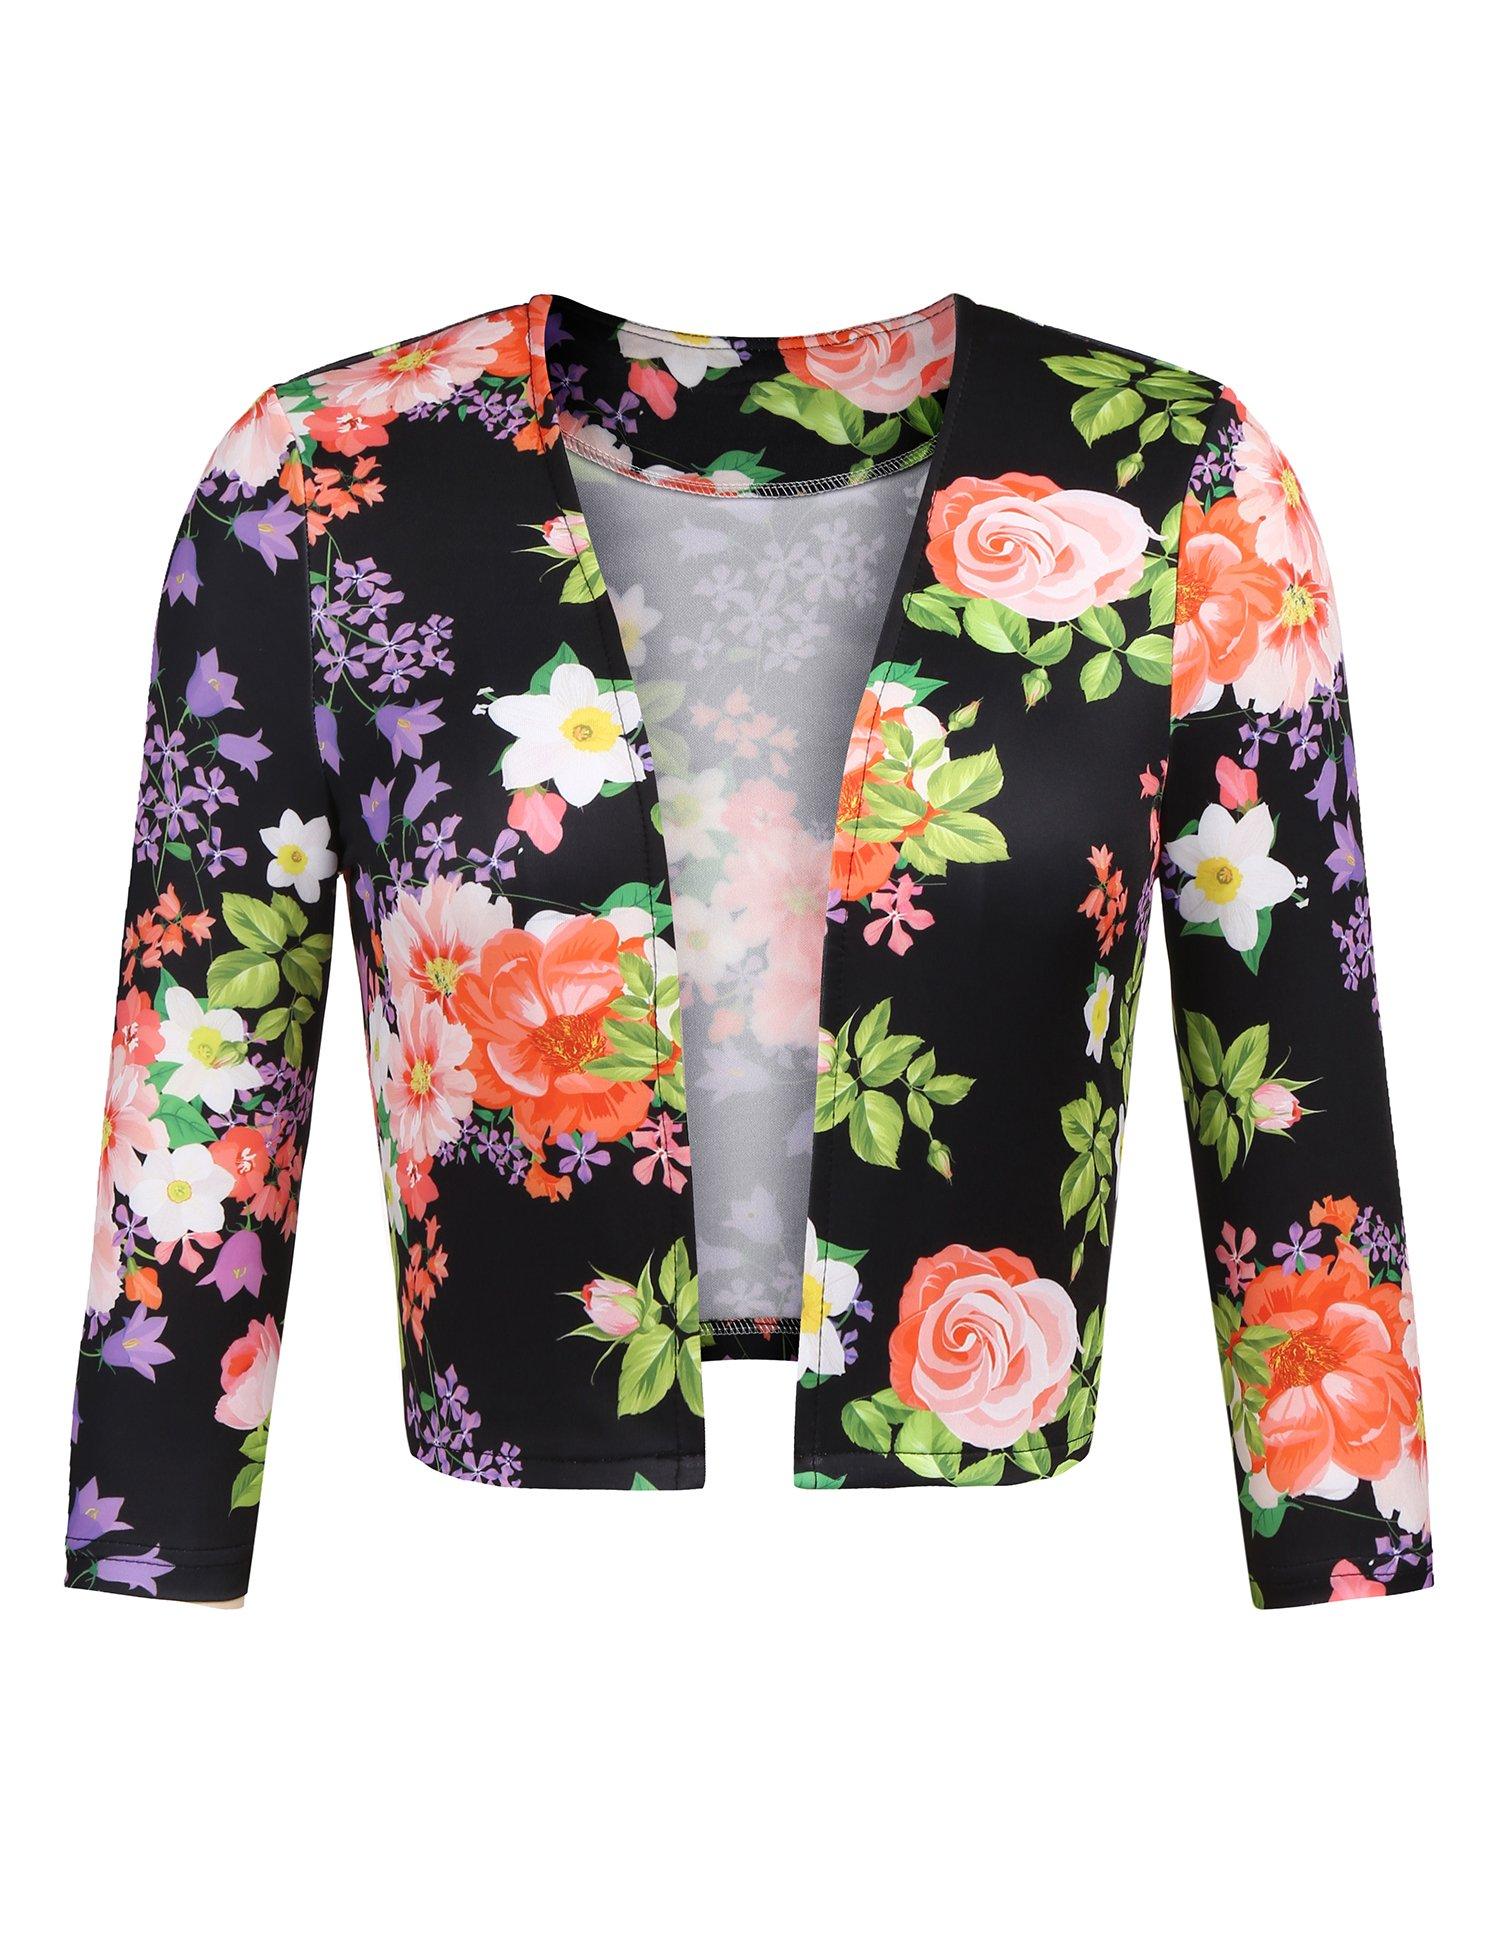 Zeagoo Women's Floral Shrug Jacket 3/4 Sleeve Cardigan Bolero Floral Blazer Black Plus Size,XXX-Large